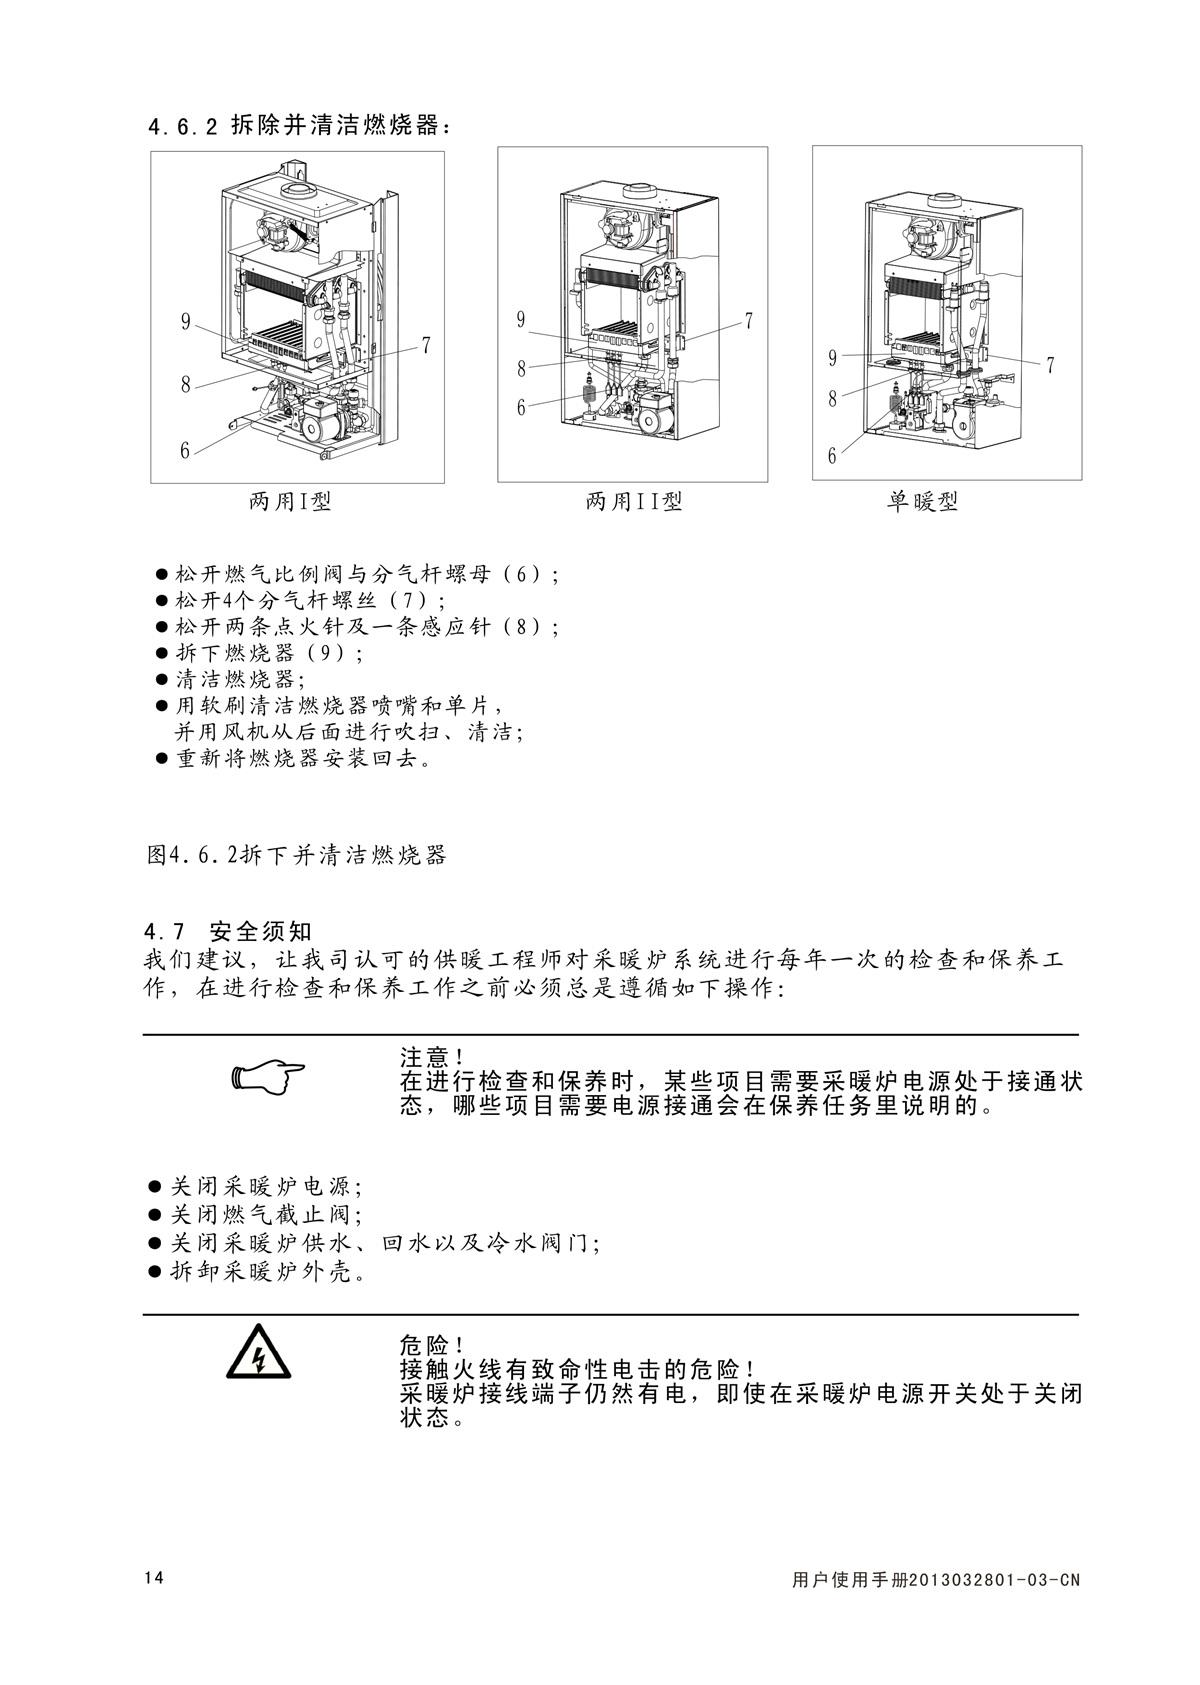 ES02系列-用户使用手册-4_01.jpg